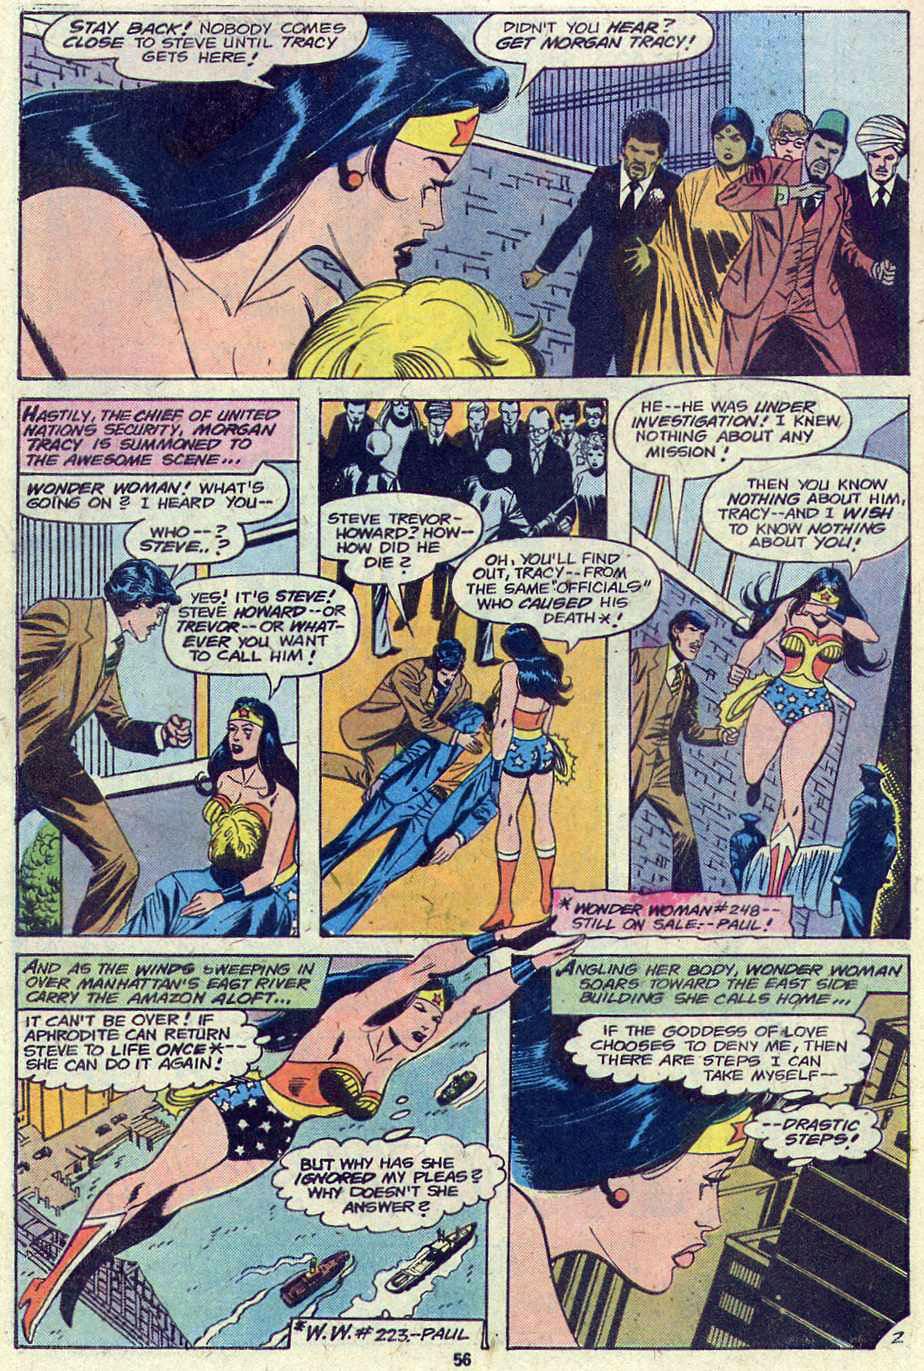 Read online Adventure Comics (1938) comic -  Issue #460 - 56